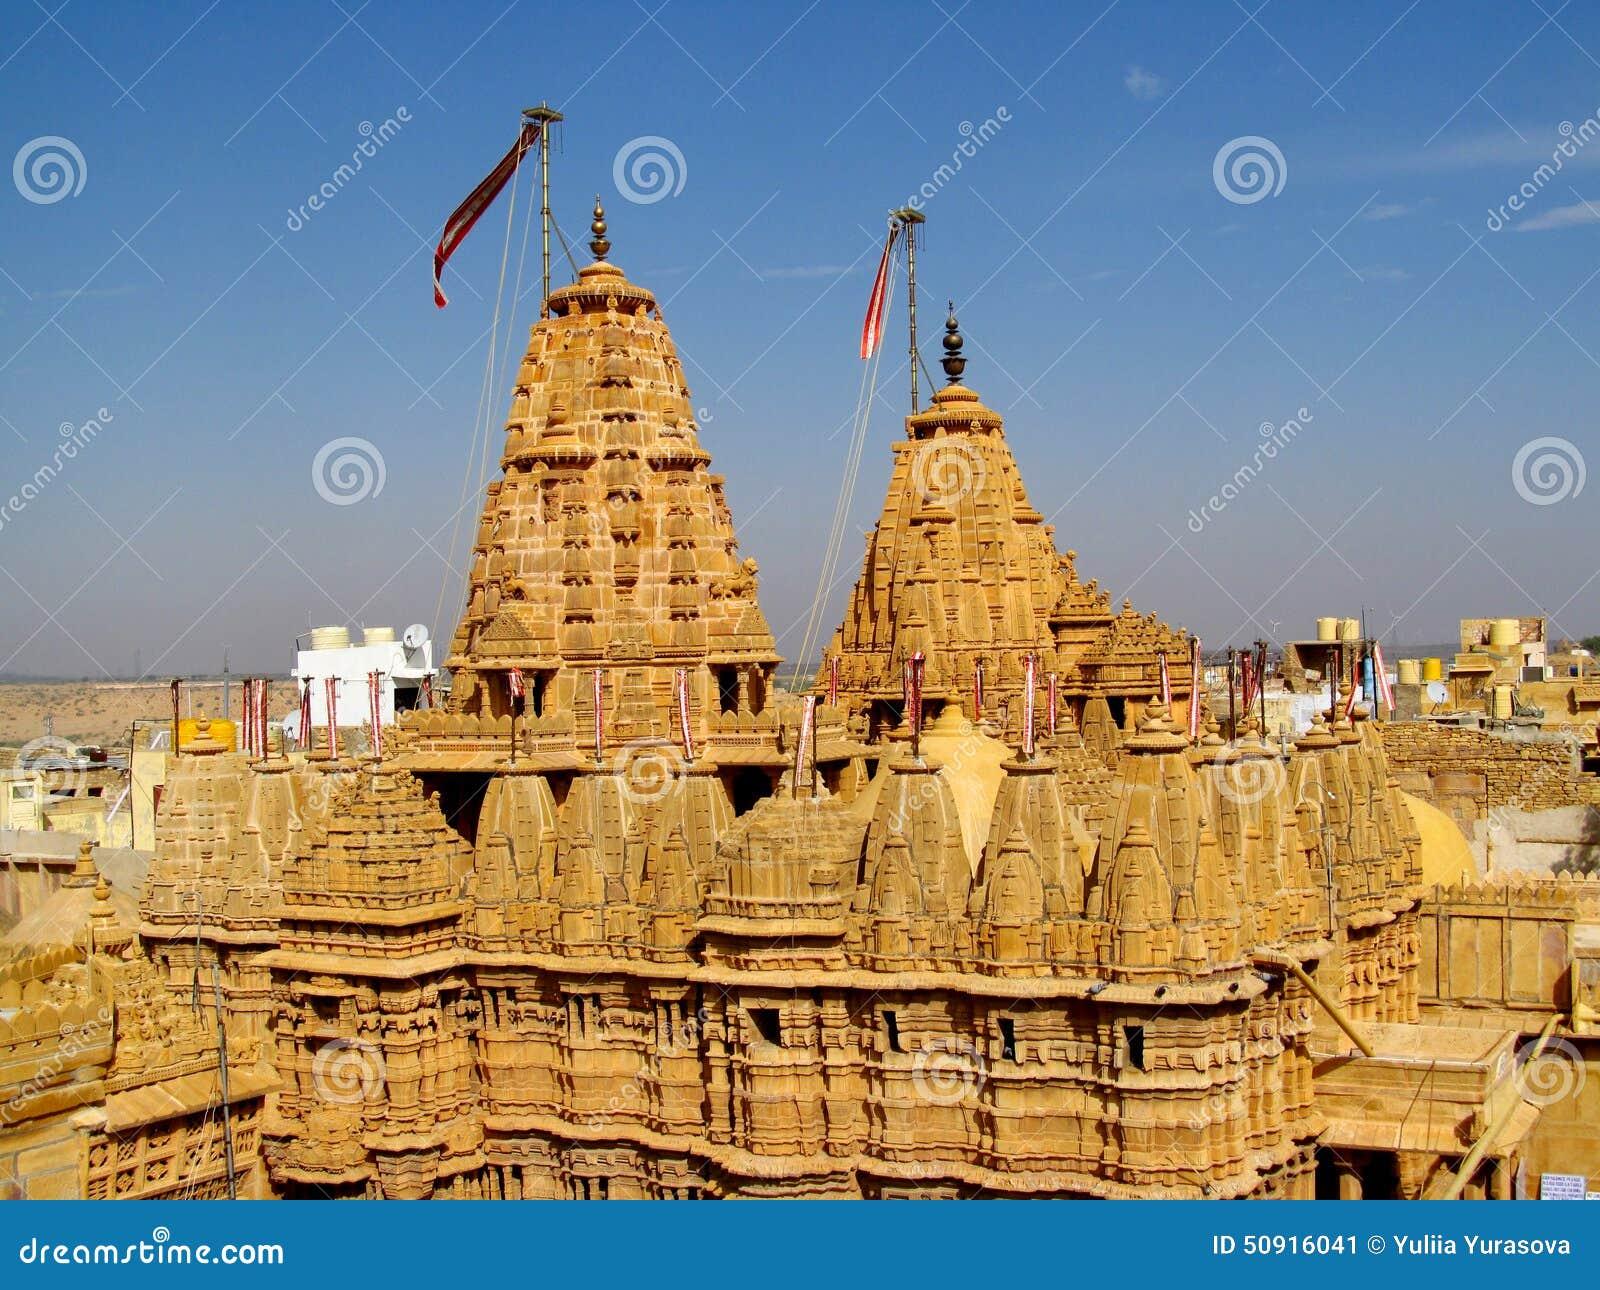 Jain temple in india jainism stock photo image 50916041 for Religious buildings in india